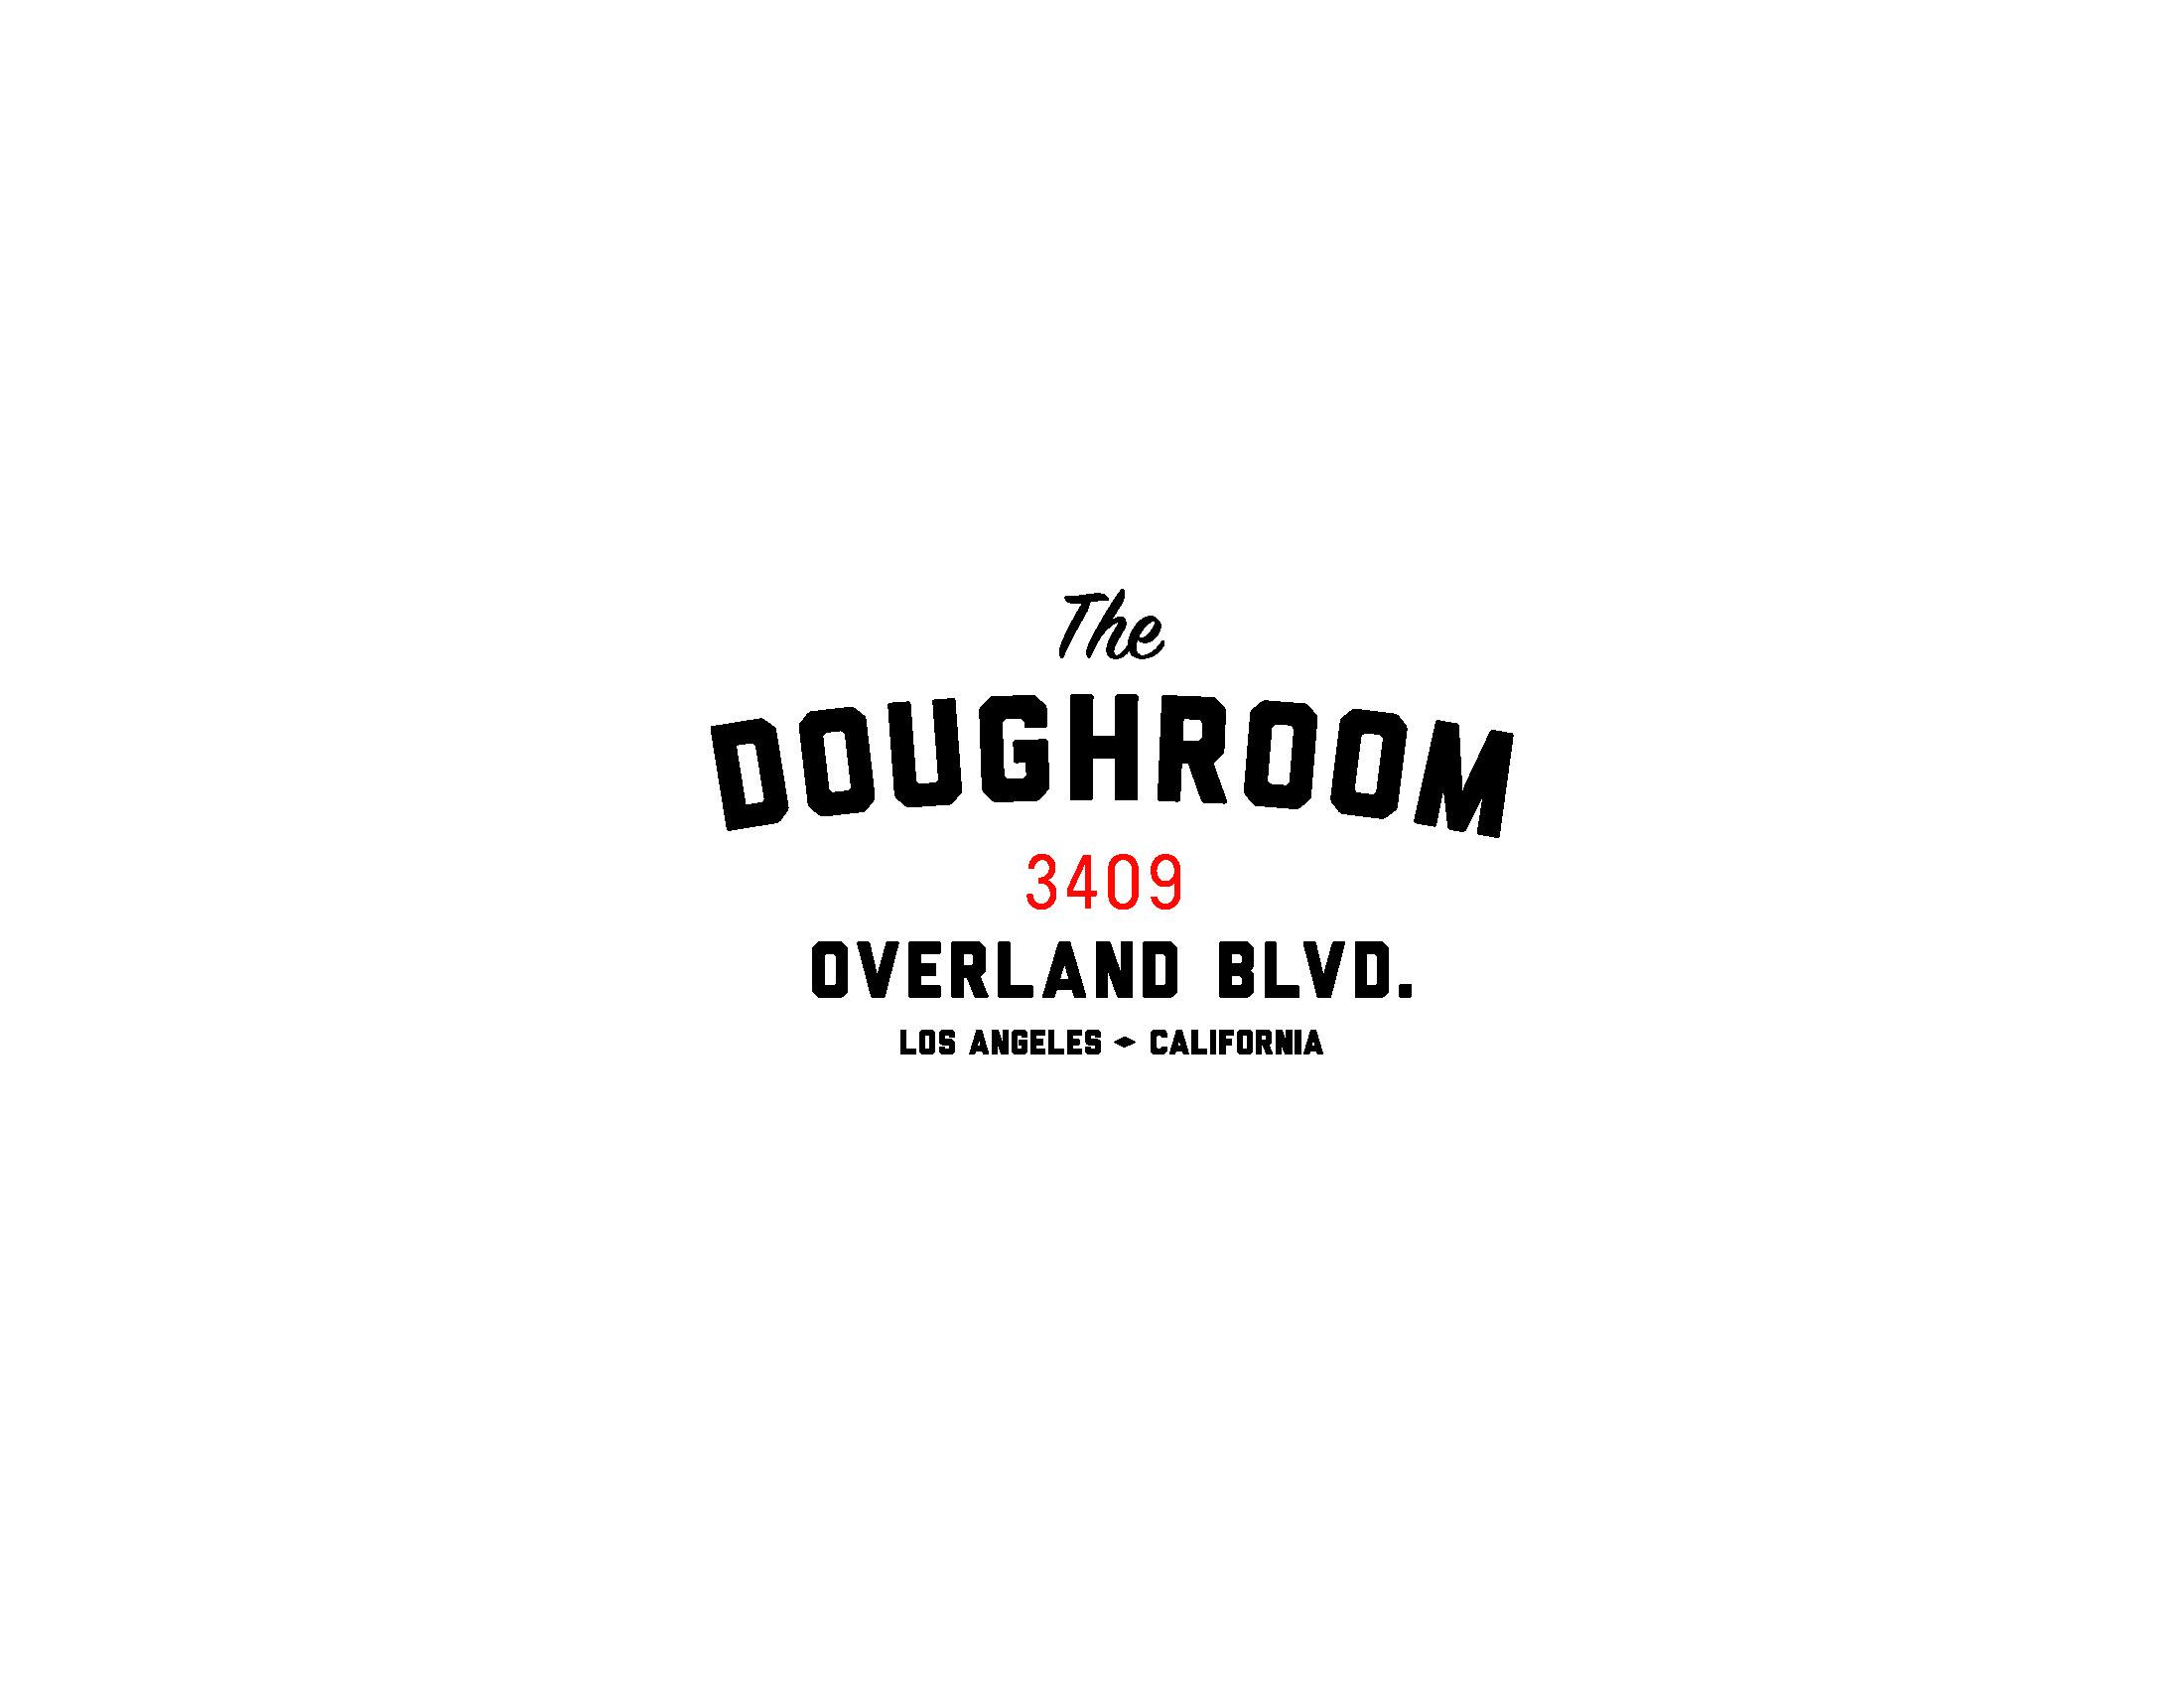 doughroom_full_noshadow